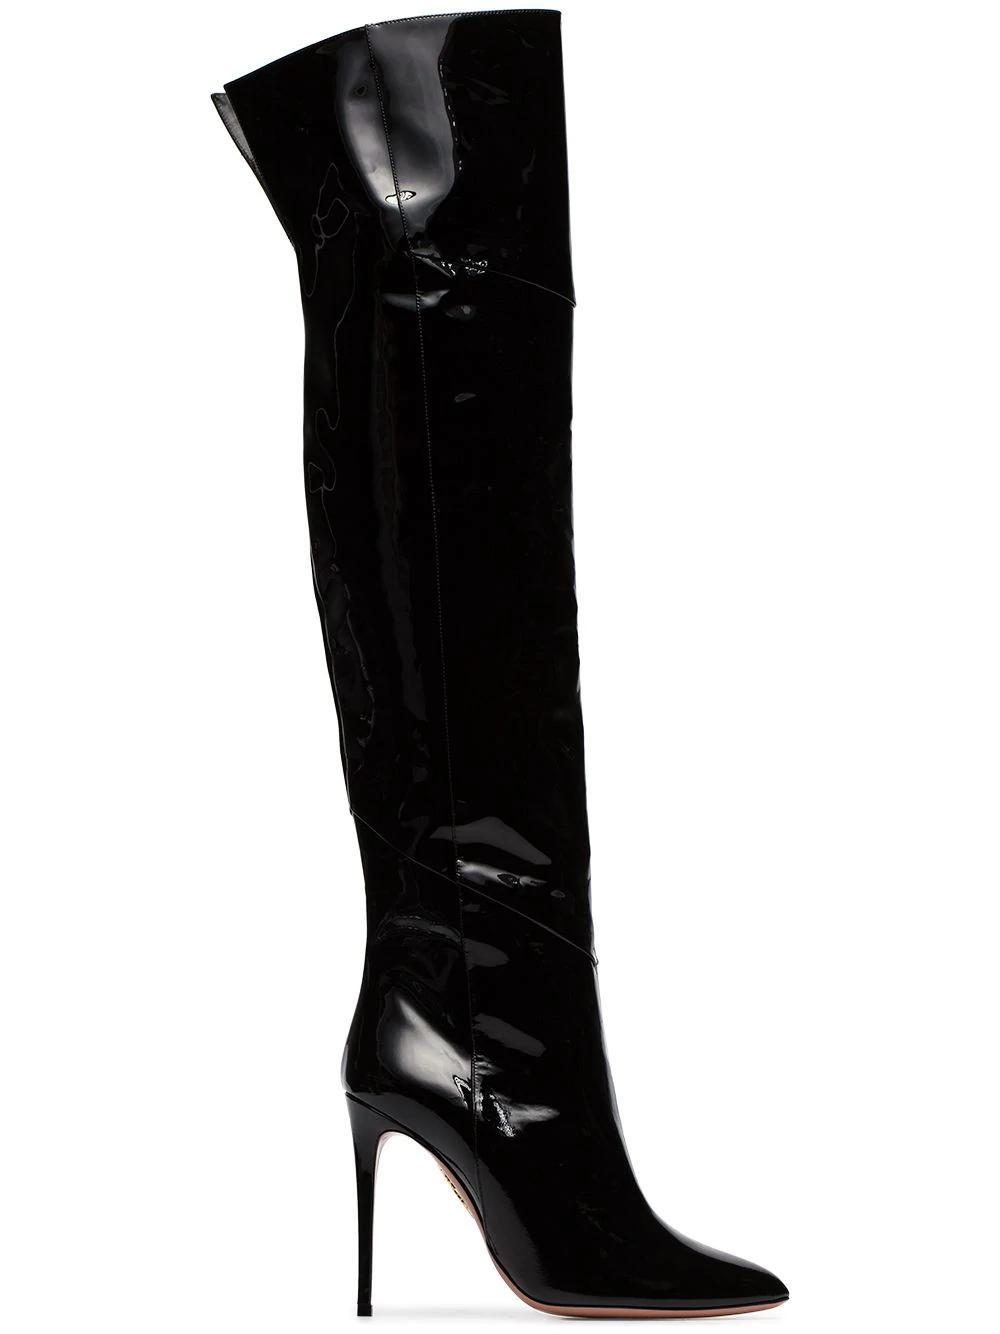 d8331357f6a Aquazzura Alma 105 Patent-Leather Over-The-Knee Boots In Black ...